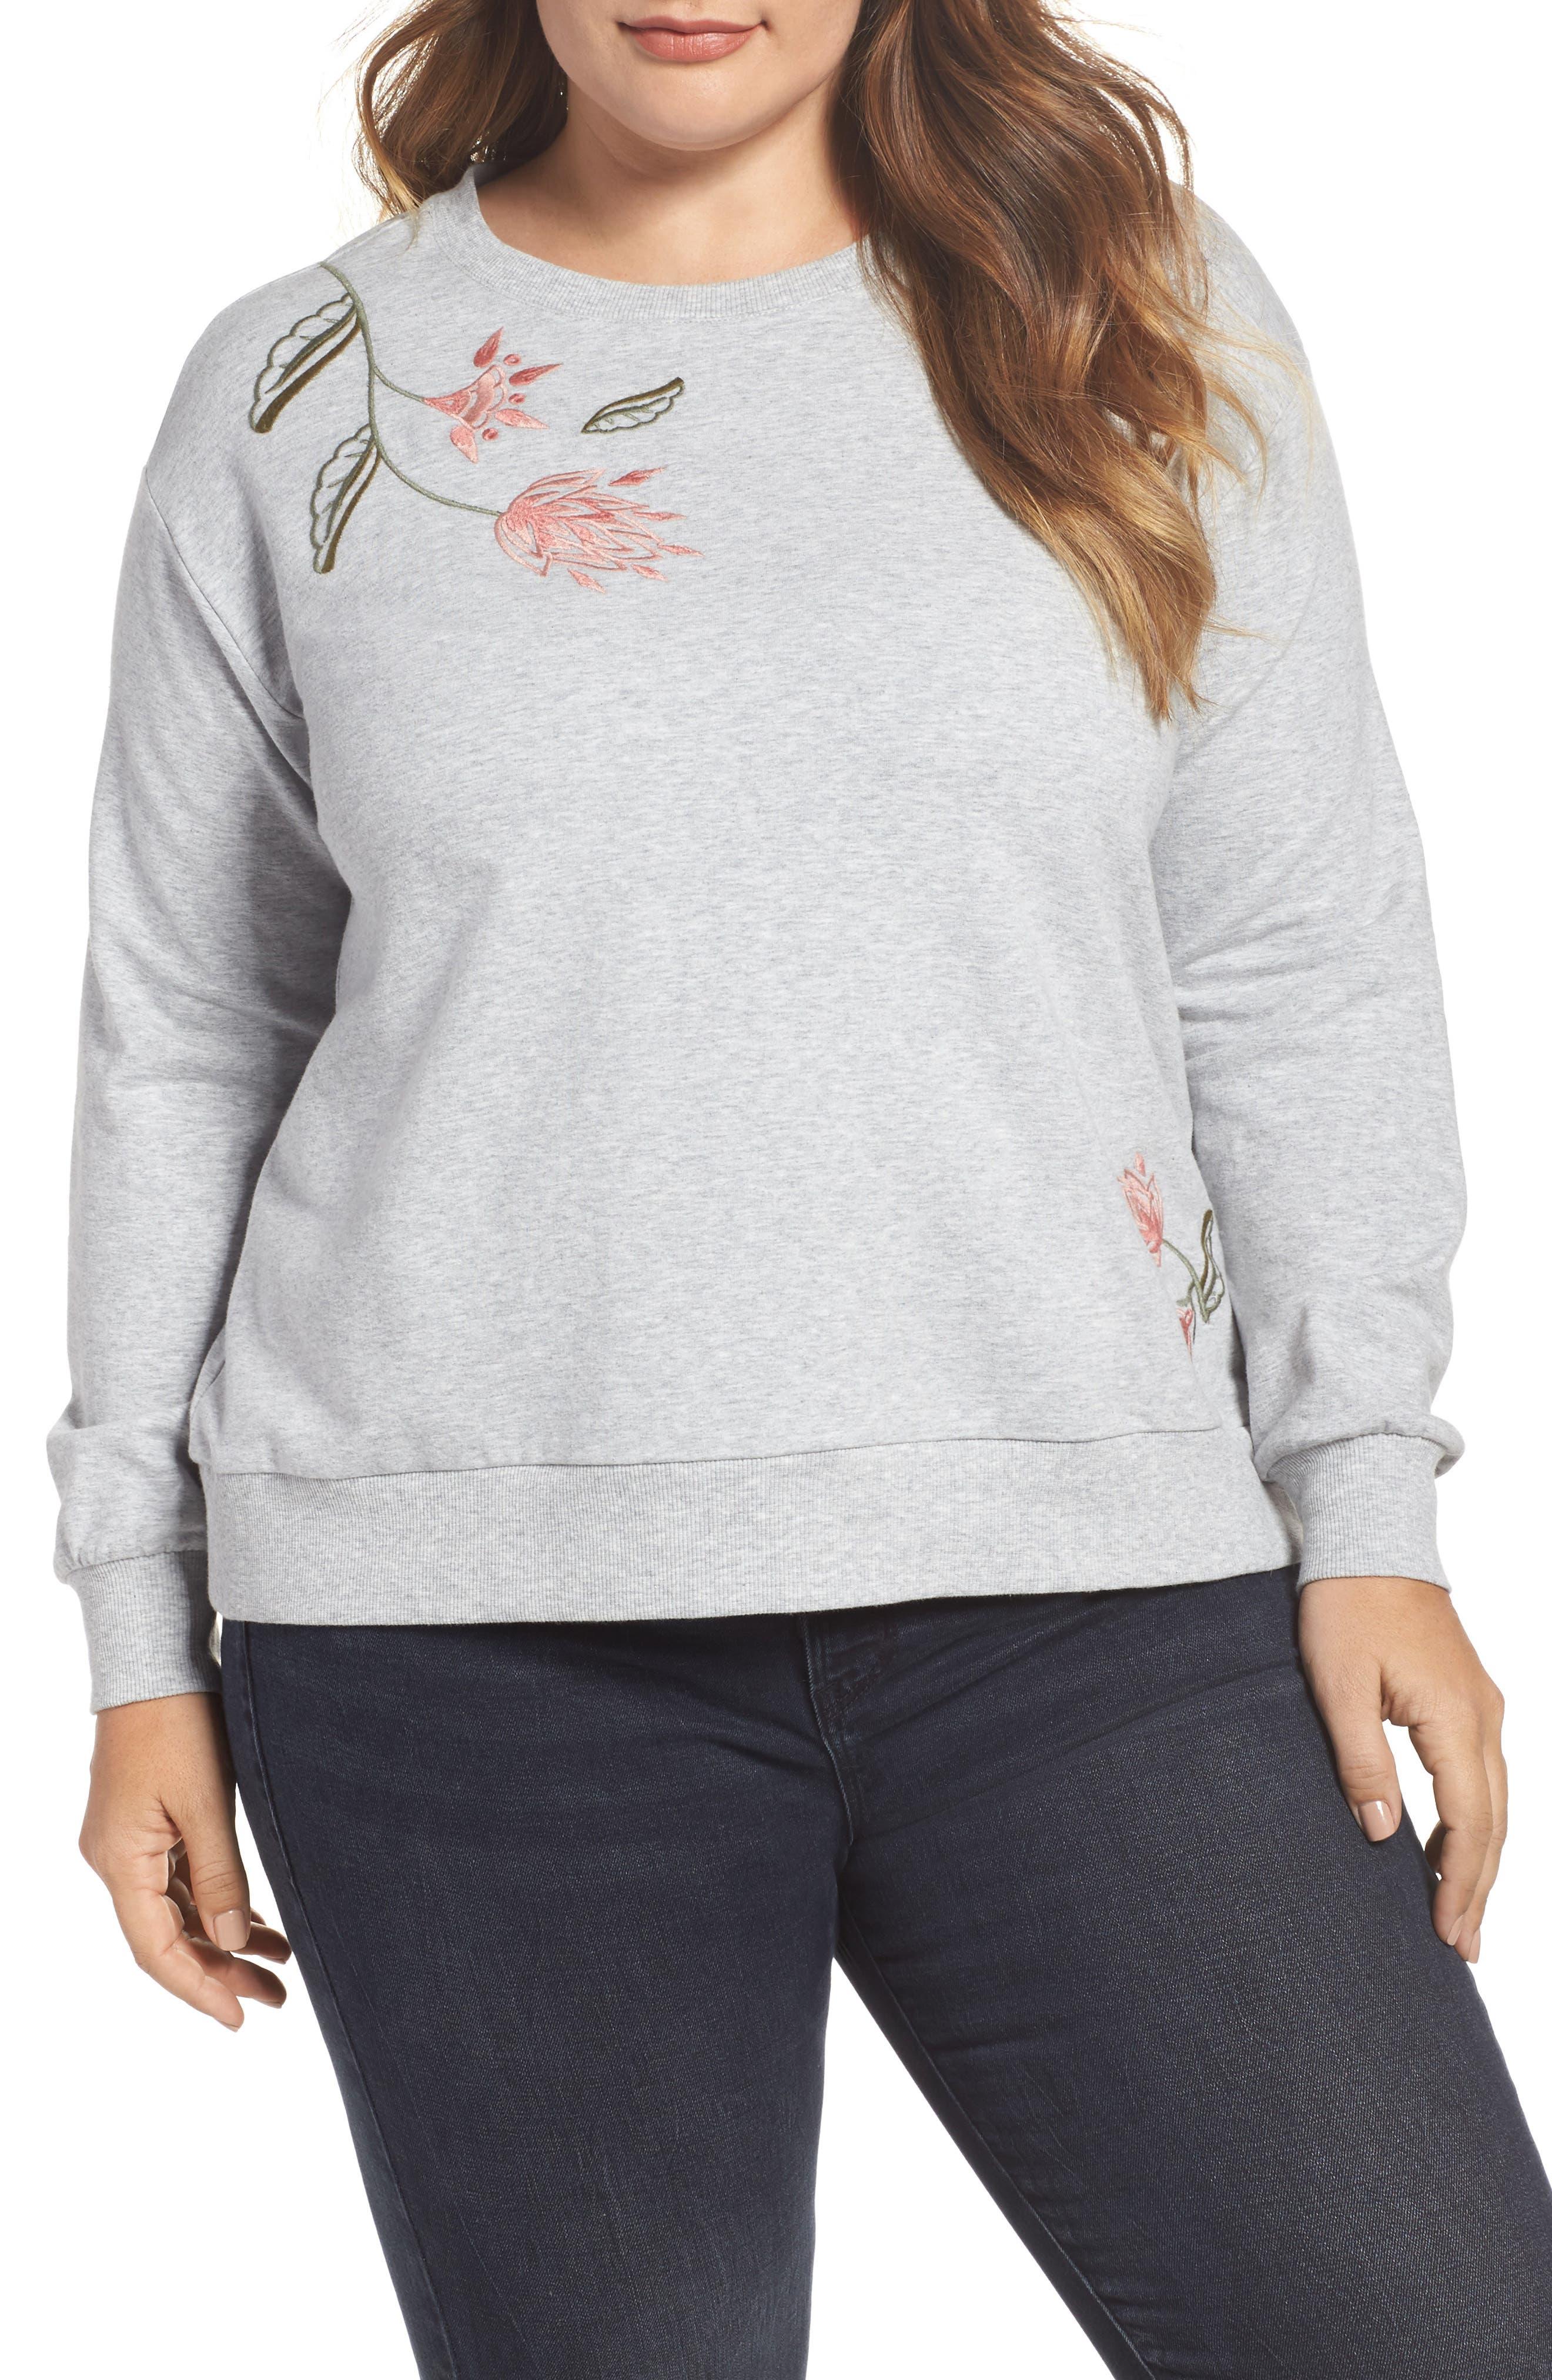 Embroidered Sweatshirt,                         Main,                         color, Grey Heather